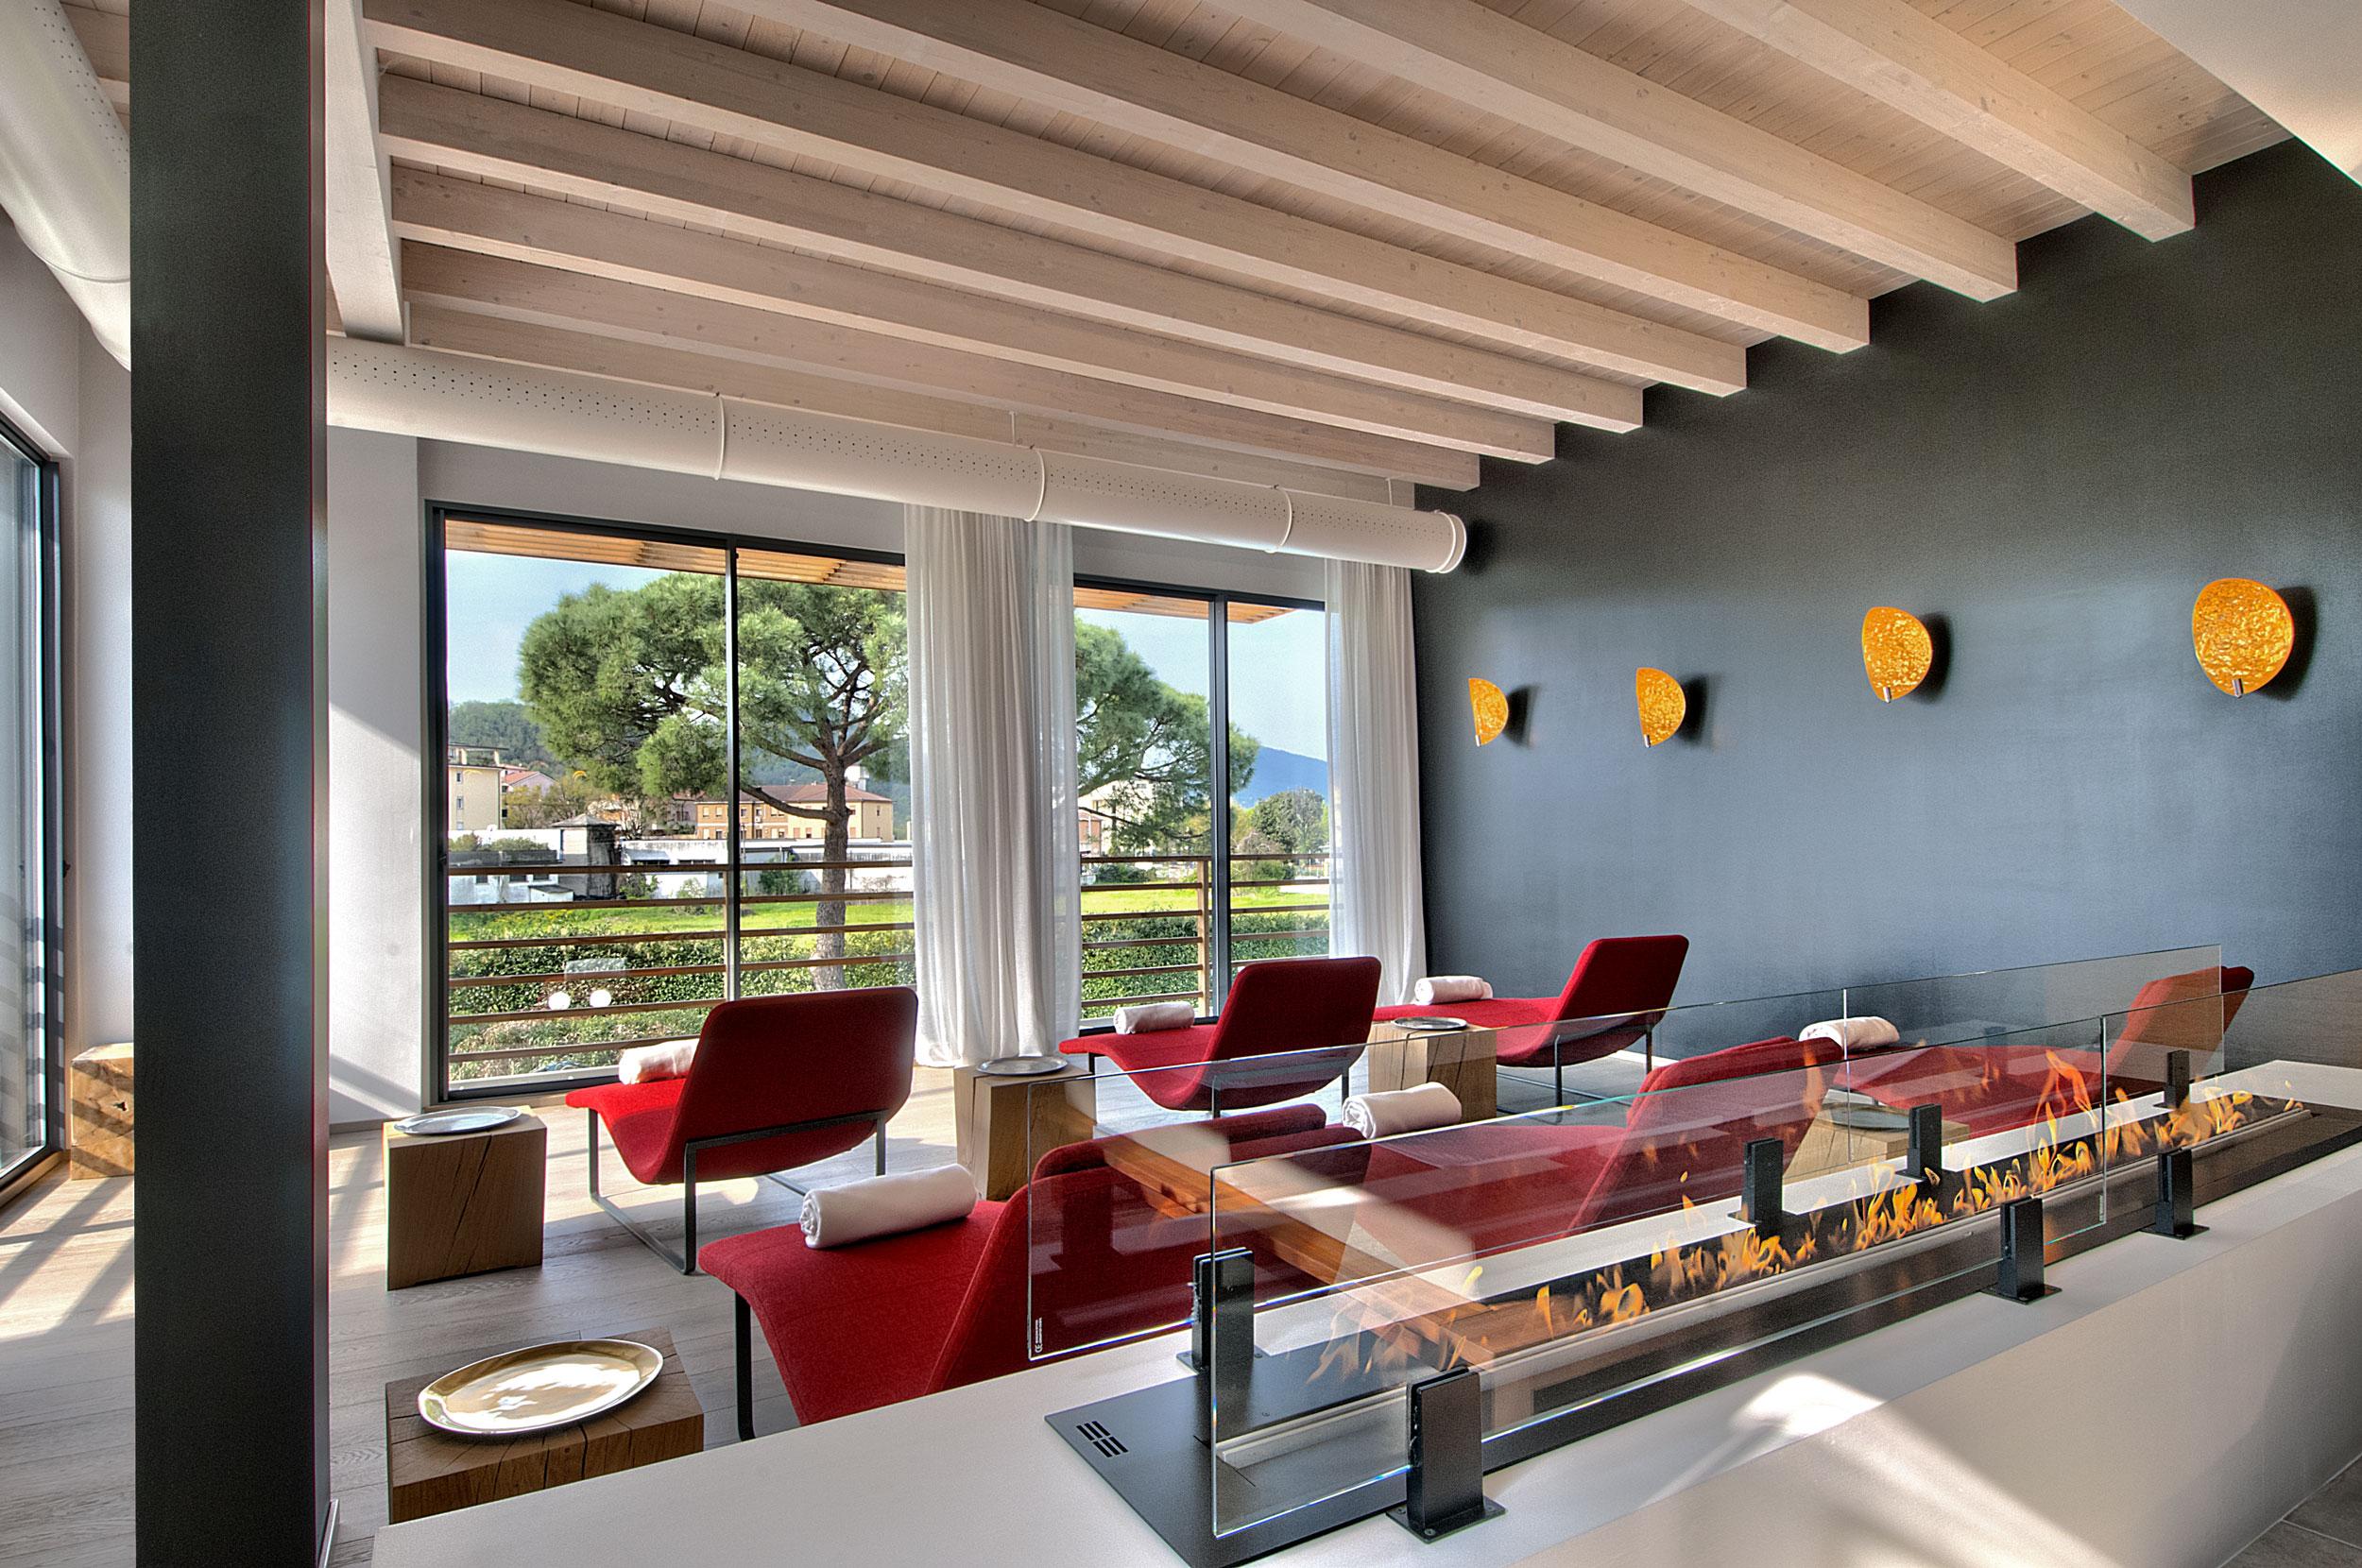 top-50-hotels-spa-esplanade-tergesteo-montegrotto-ruheraum-pool-decohome.de_